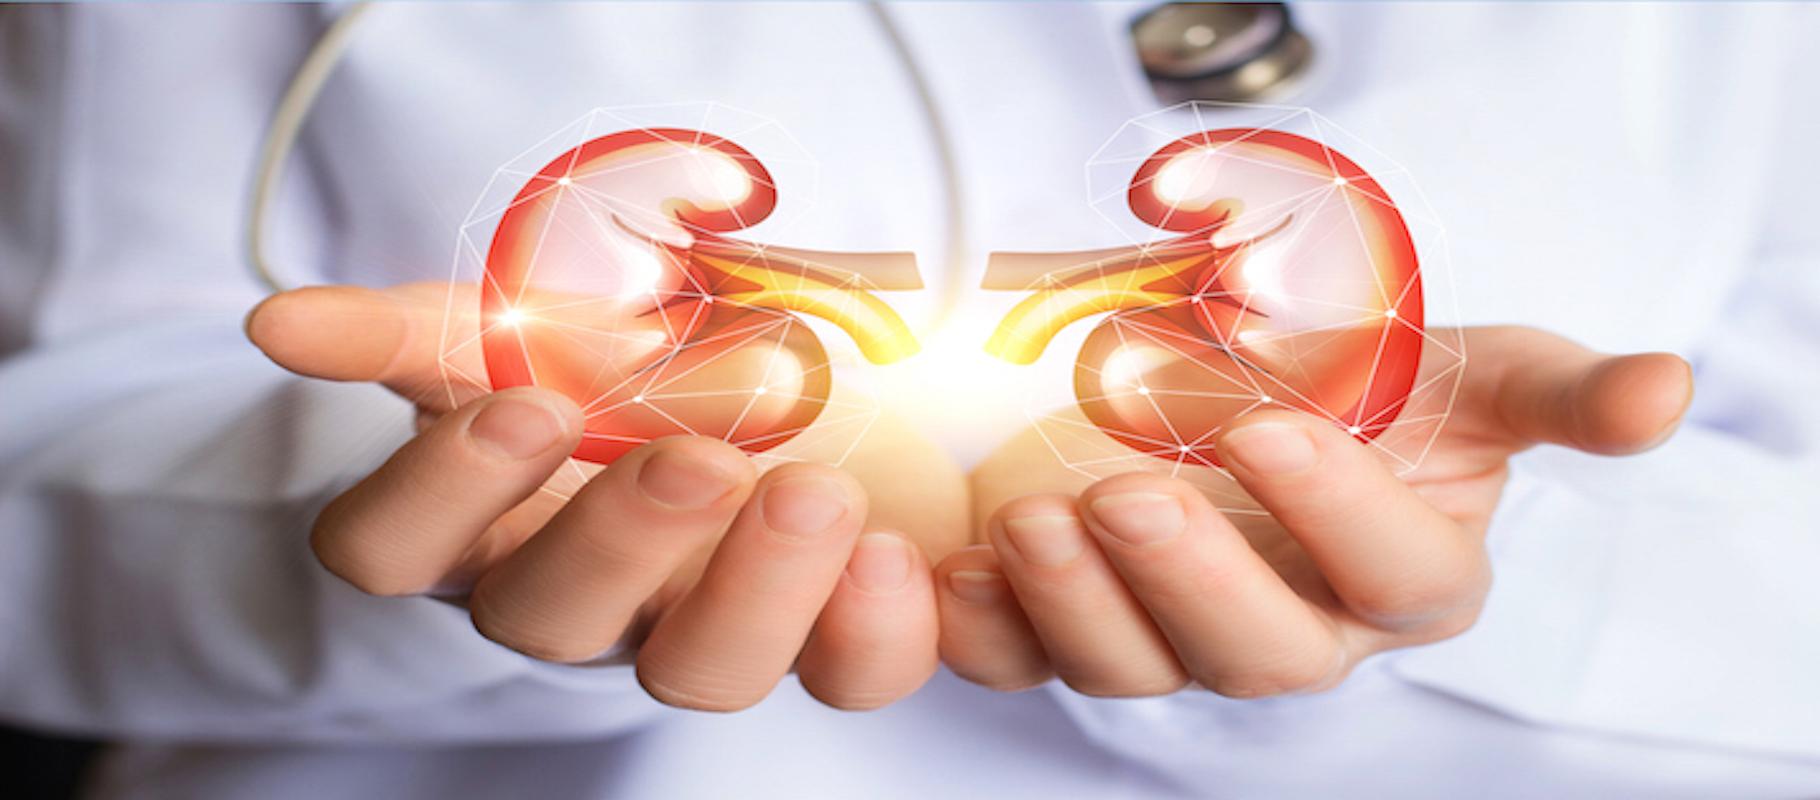 Discovery Radio – Episode 36: Kidney Disease (IgA Nephropathy): Treatment Through Transplant